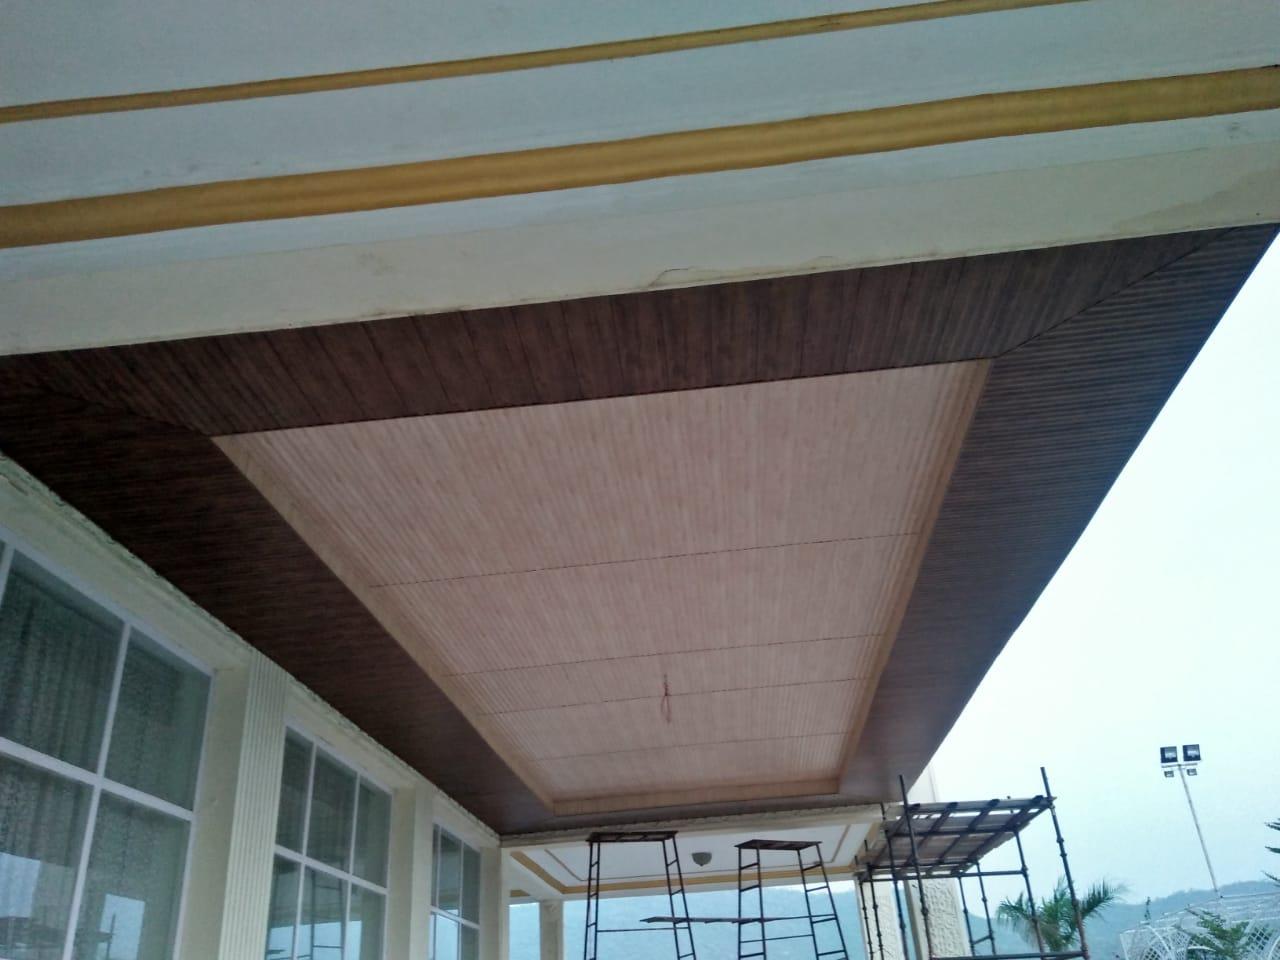 pvc-false-ceiling-design-17.jpeg